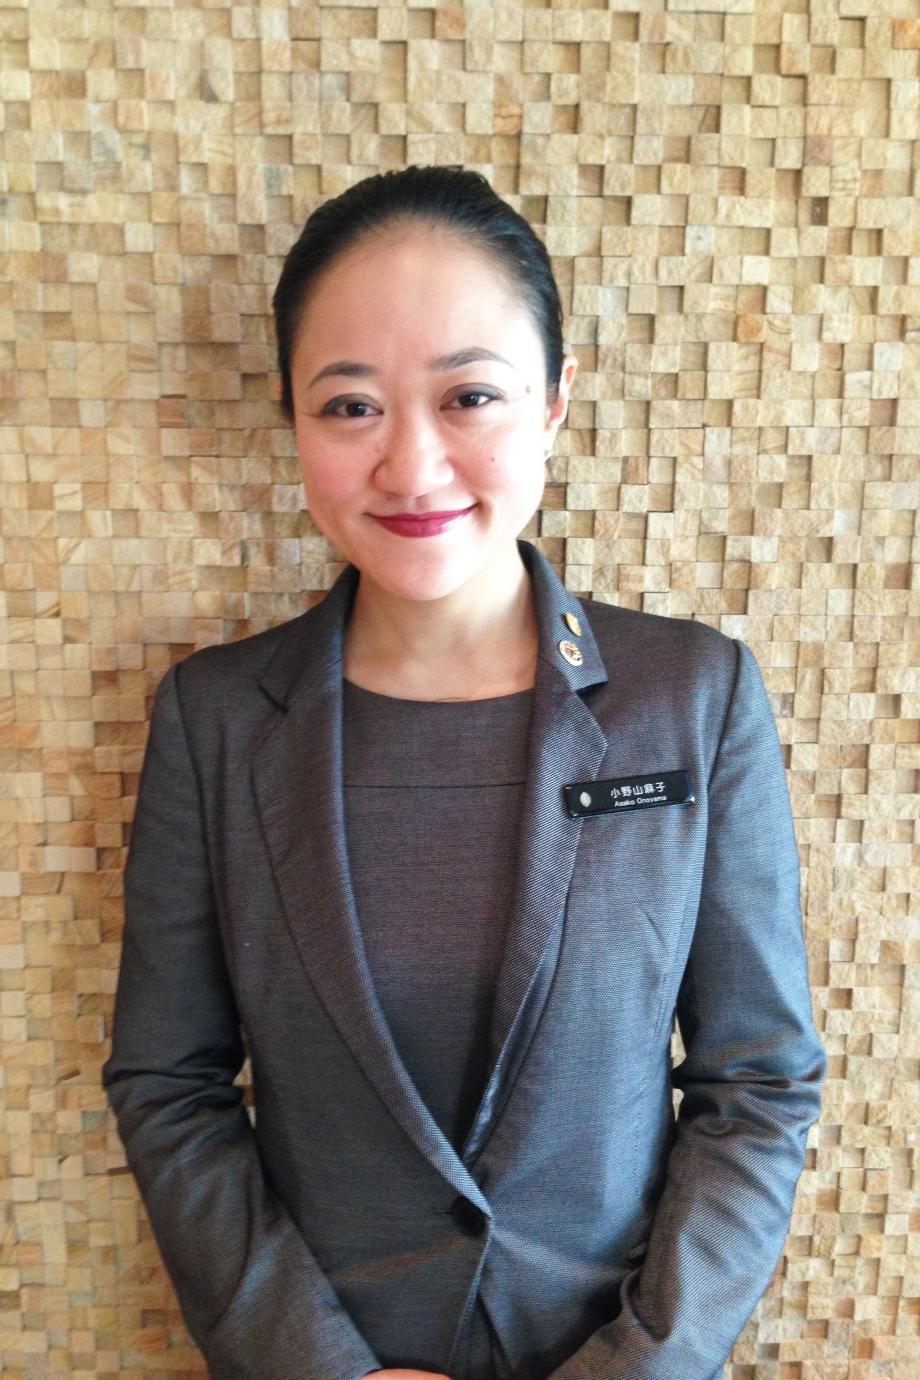 Ms. Asako Onoyama, Chief Concierge of InterContinental Osaka - AspirantSG